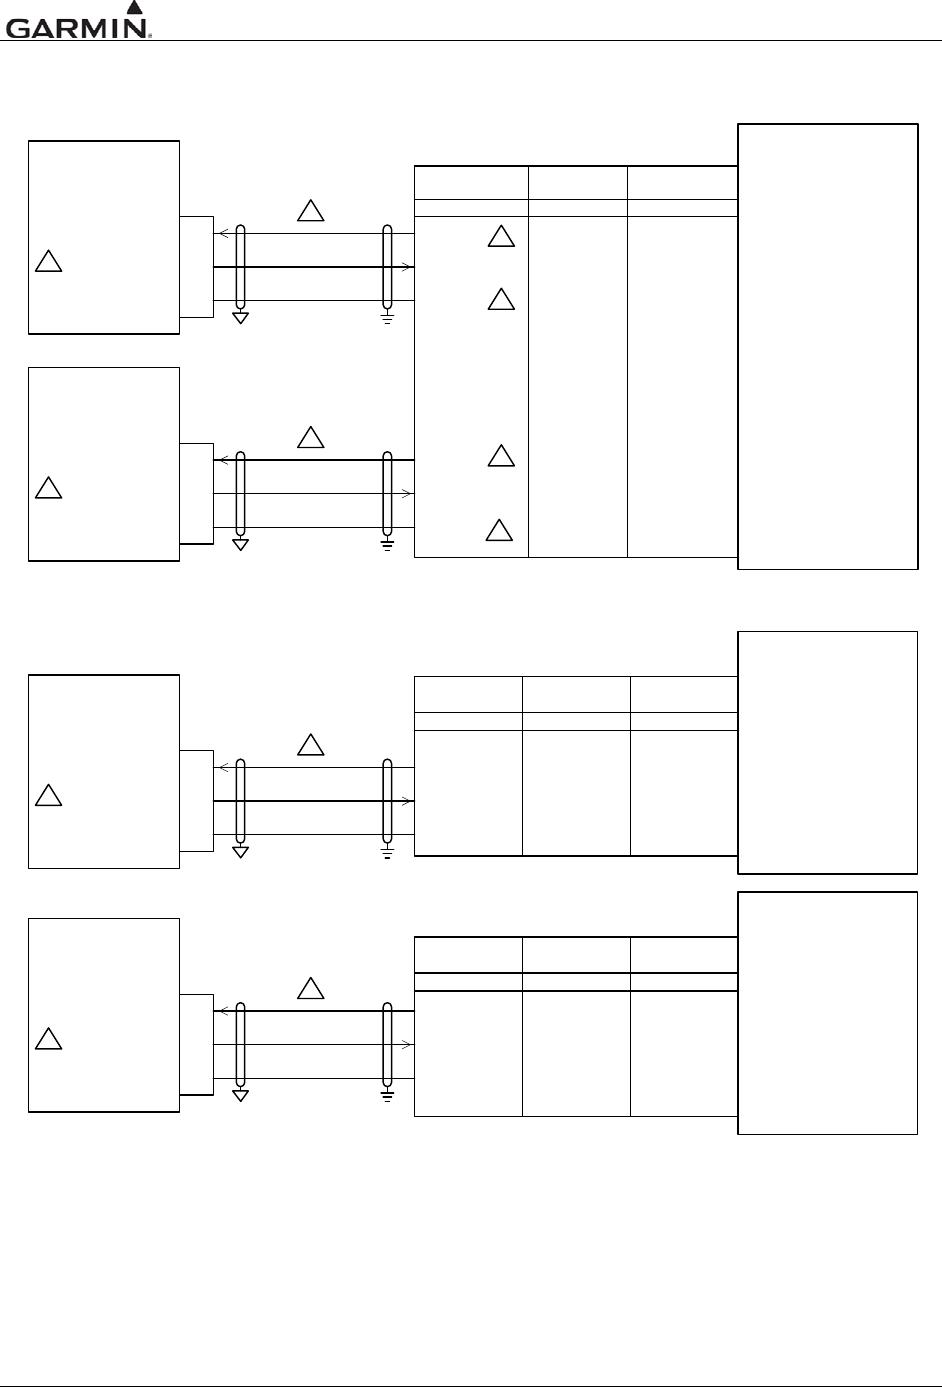 Handleiding Garmin Gtn 650 Pagina 326 Van 412 English 232 Wiring Diagram 6xx 7xx Aml Stc Installation Manual 190 01007 A3